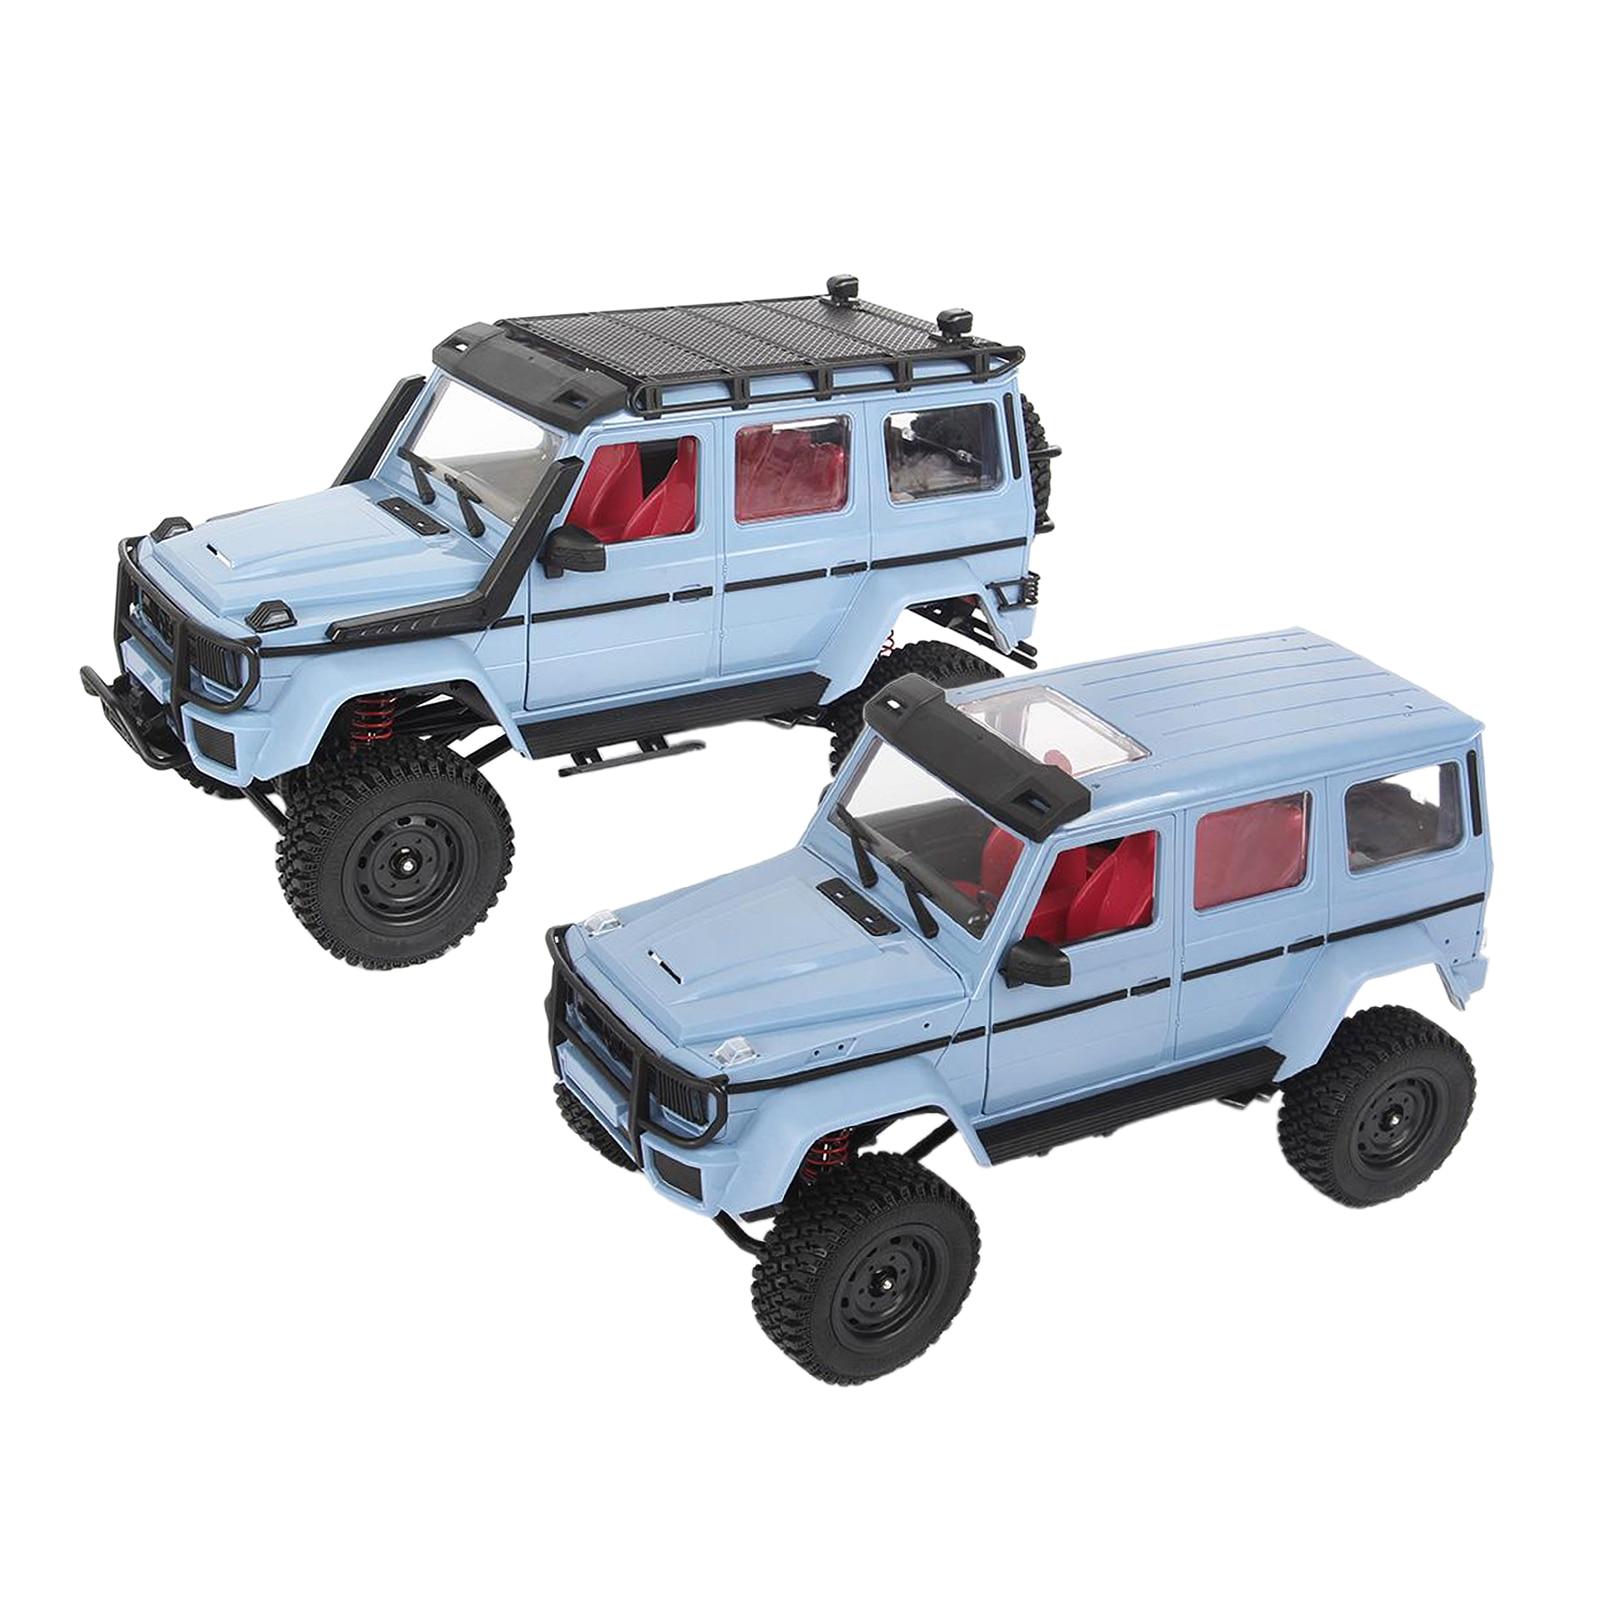 1:12 MN86K/MN86KS 2.4G 4WD Climbing Truck Car Model Toys 390 Power Motor enlarge